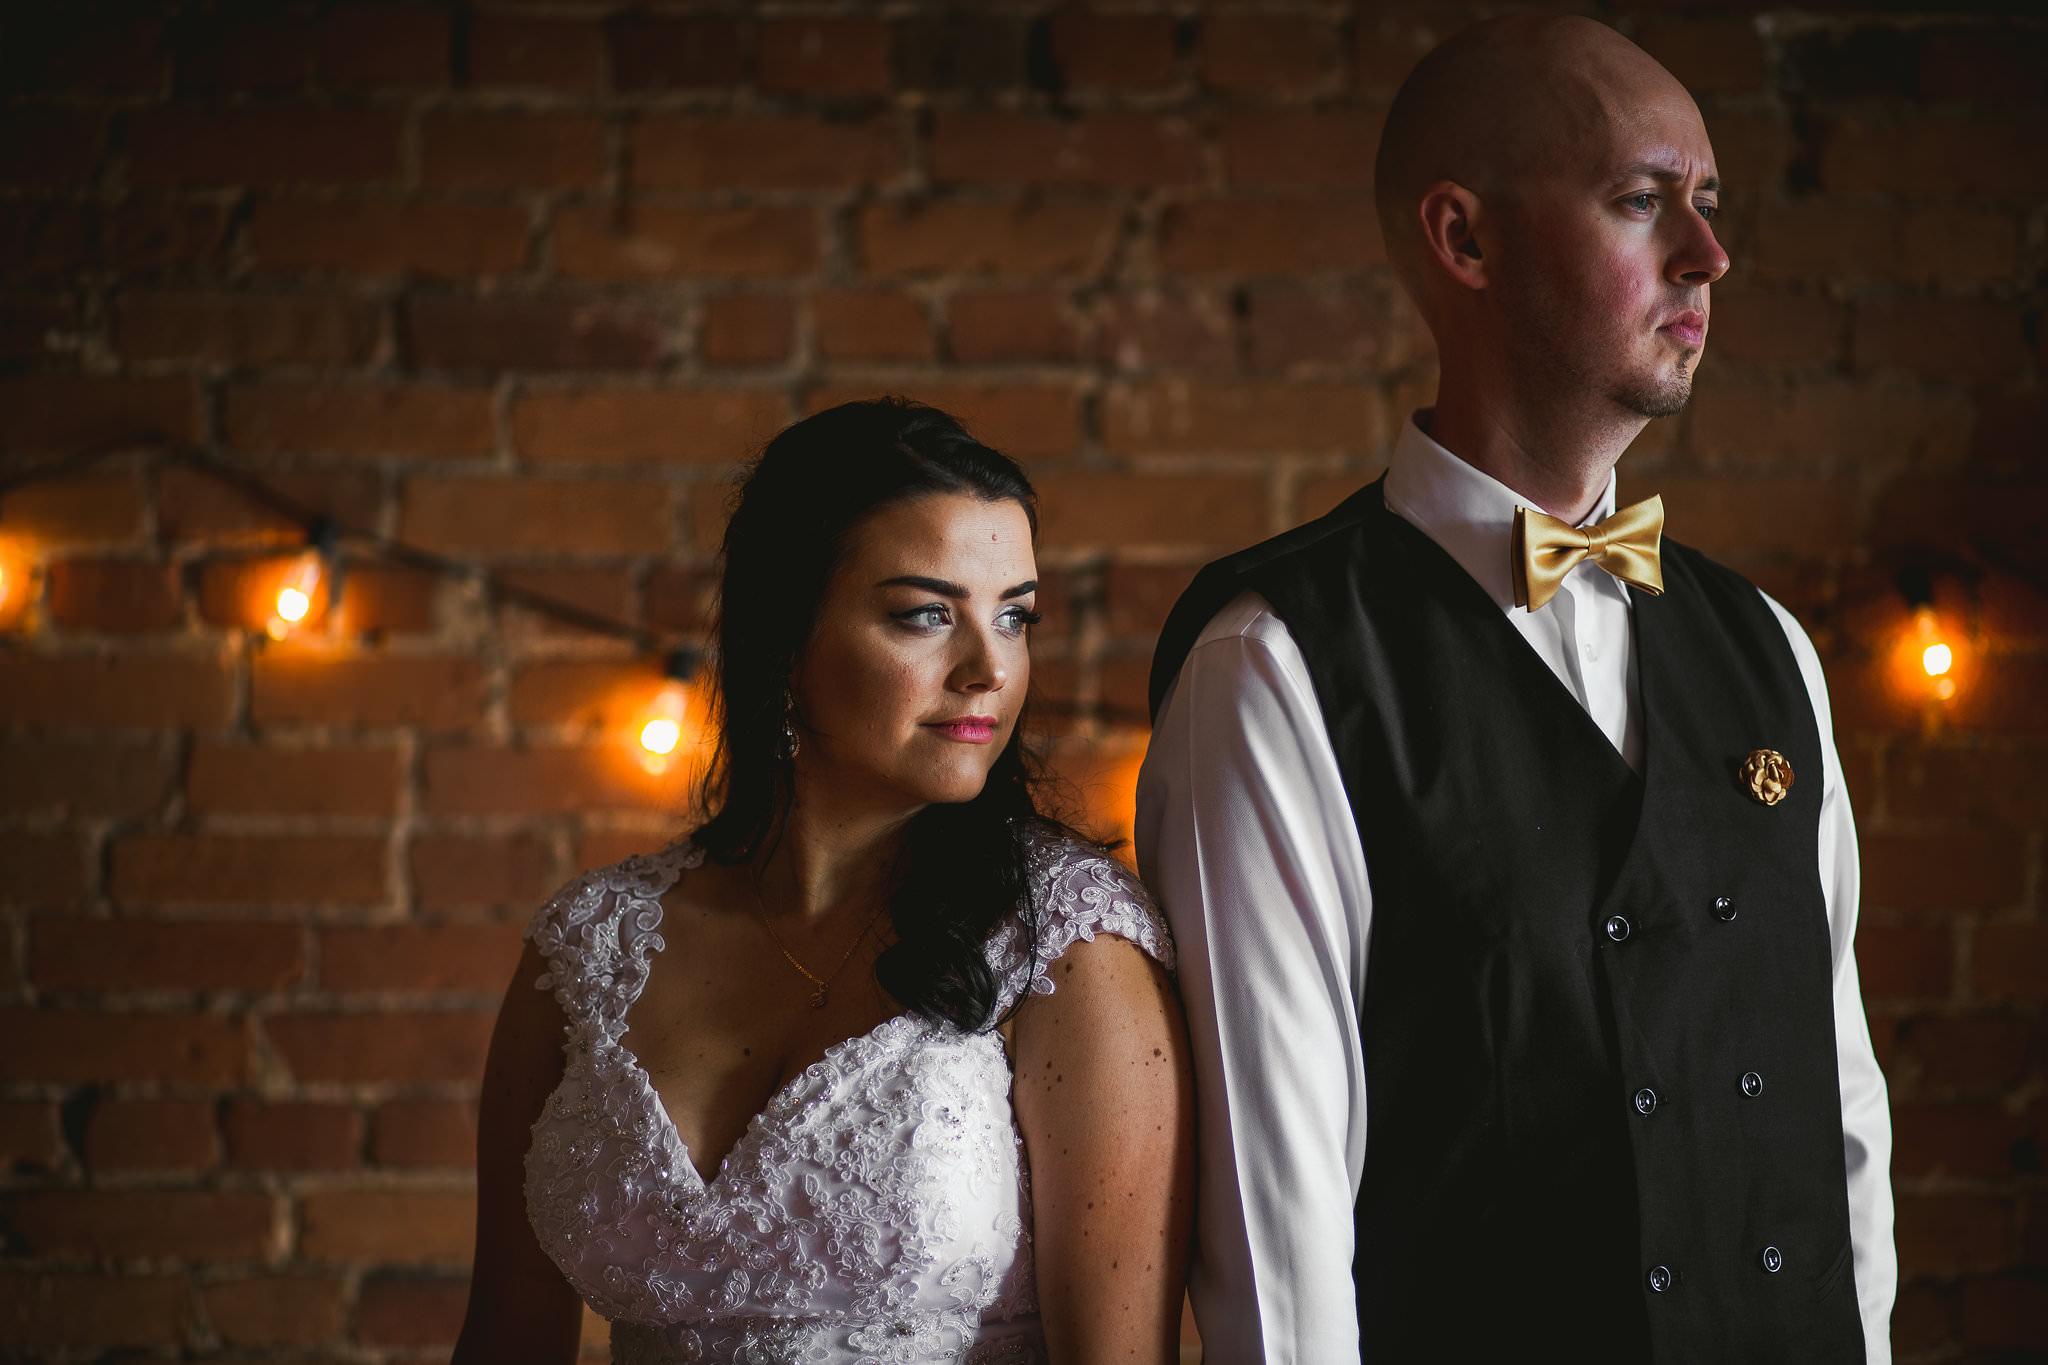 Kristen Adam Kindred Loft Whitby Wedding Photos 324 - Durham Wedding Photographer: Kindred Loft Wedding Photos